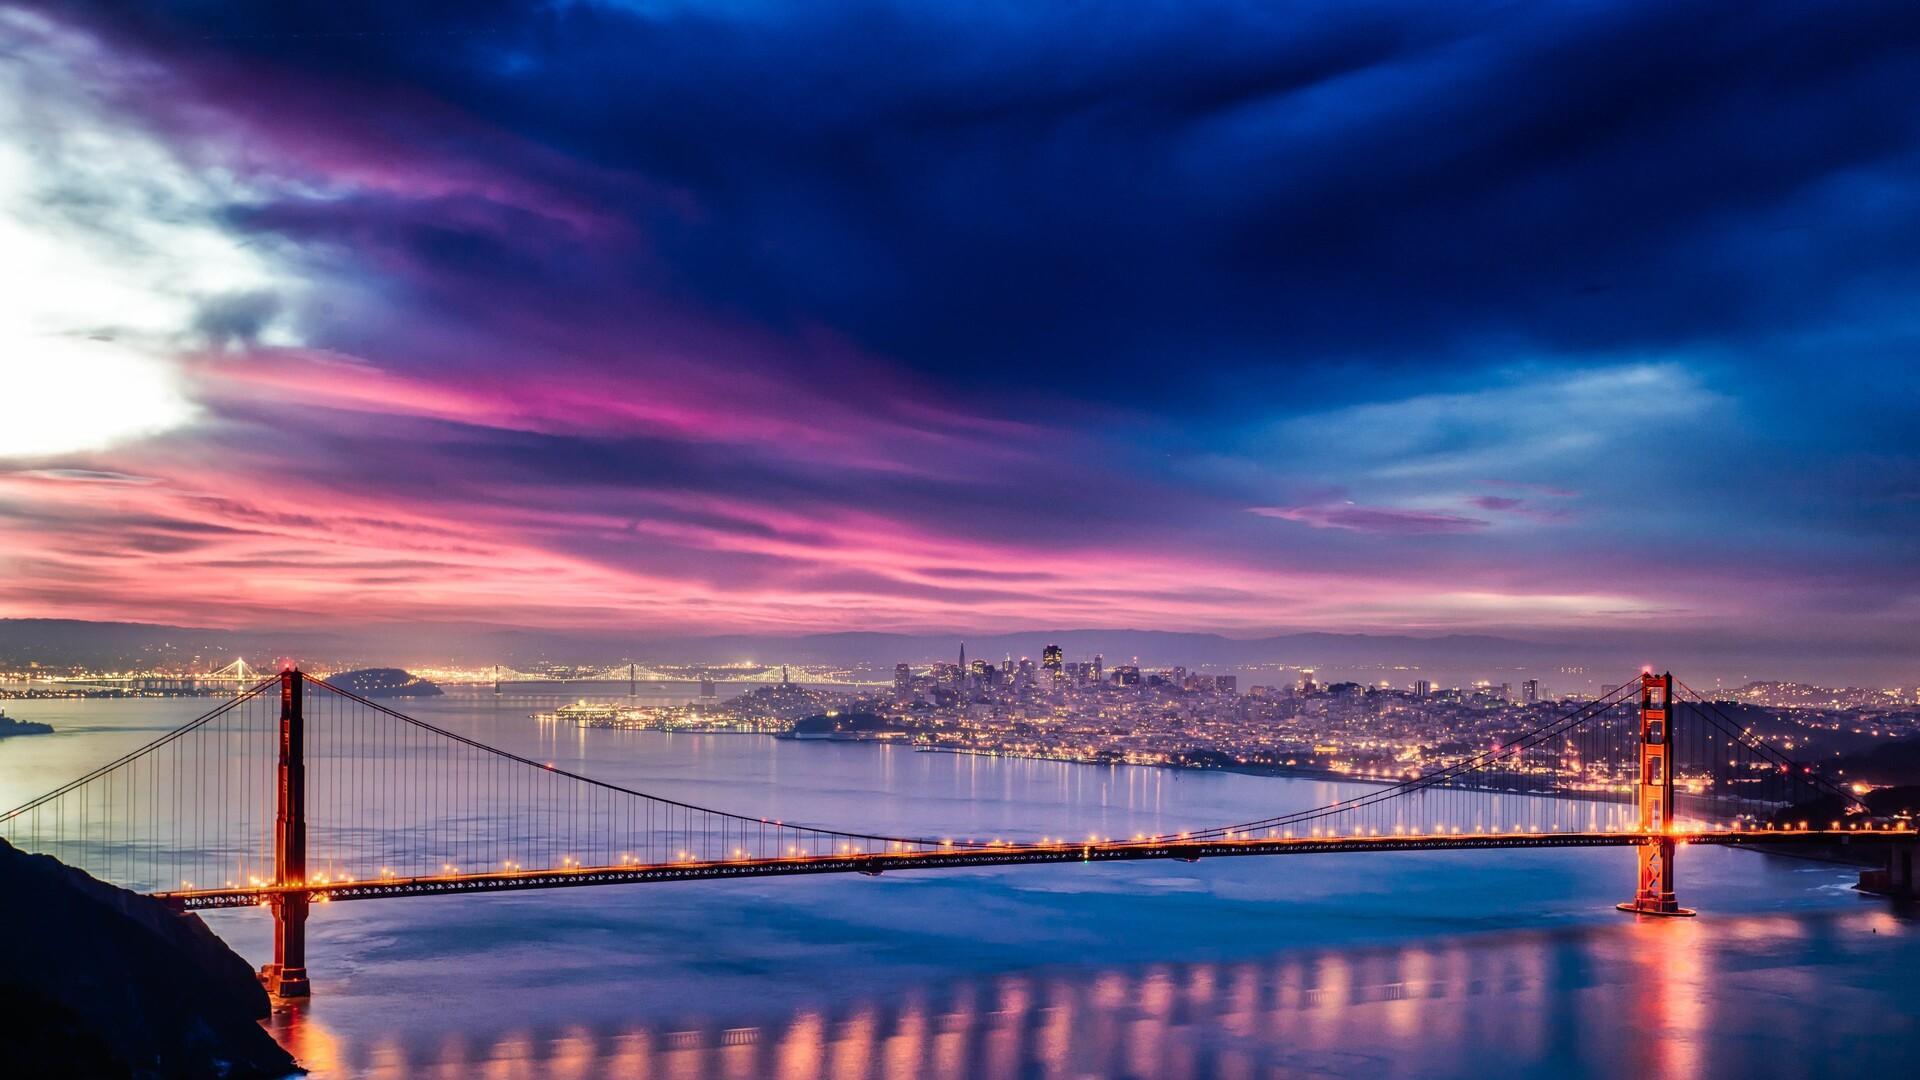 1920x1080 Golden Gate Bridge Sunset Night Time 4k Hd ...